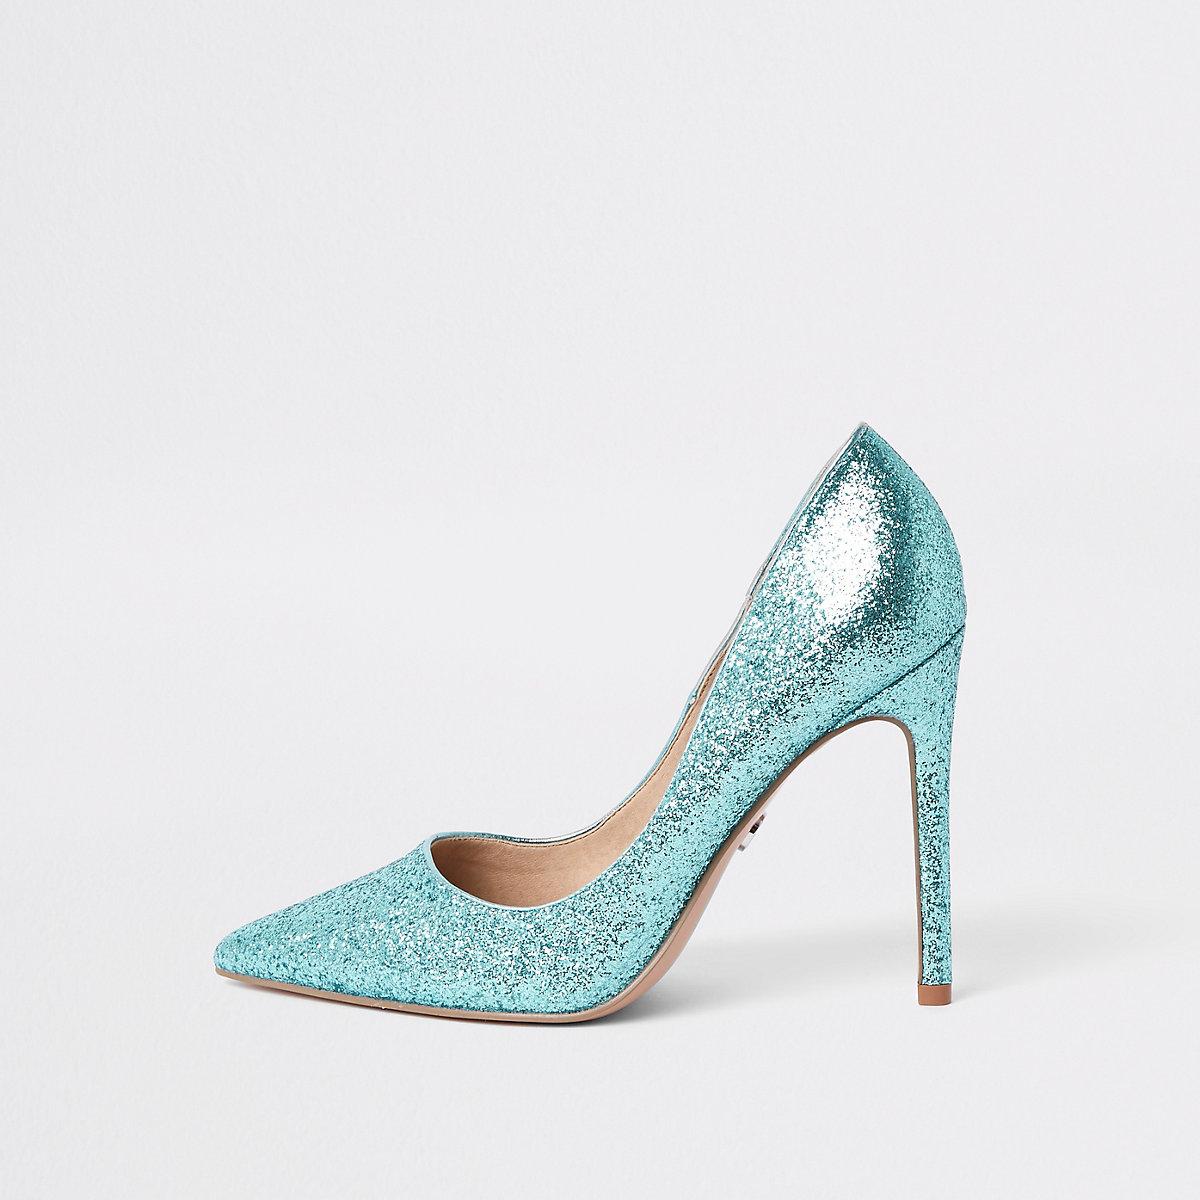 Blue glitter court shoes